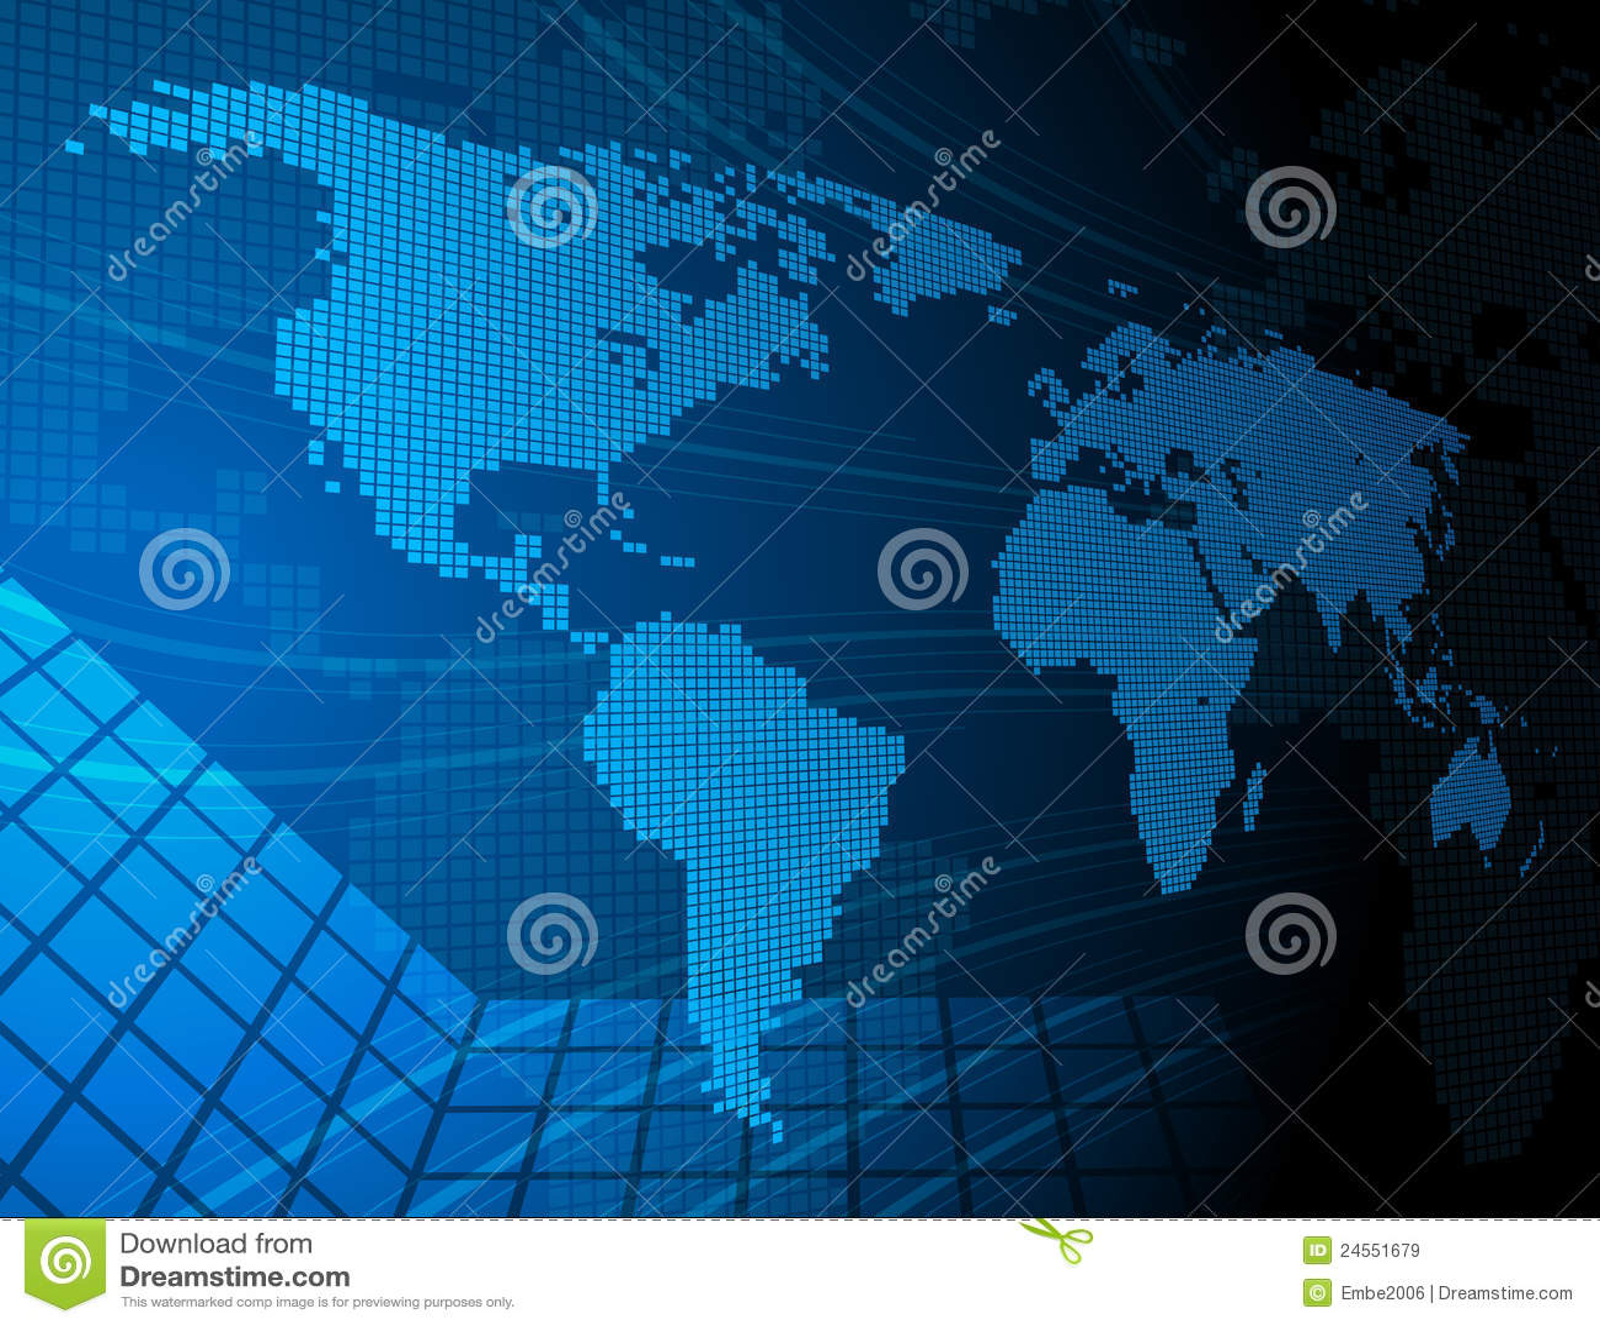 Digital world map stock vector illustration of detail 24551679 download digital world map stock vector illustration of detail 24551679 gumiabroncs Images